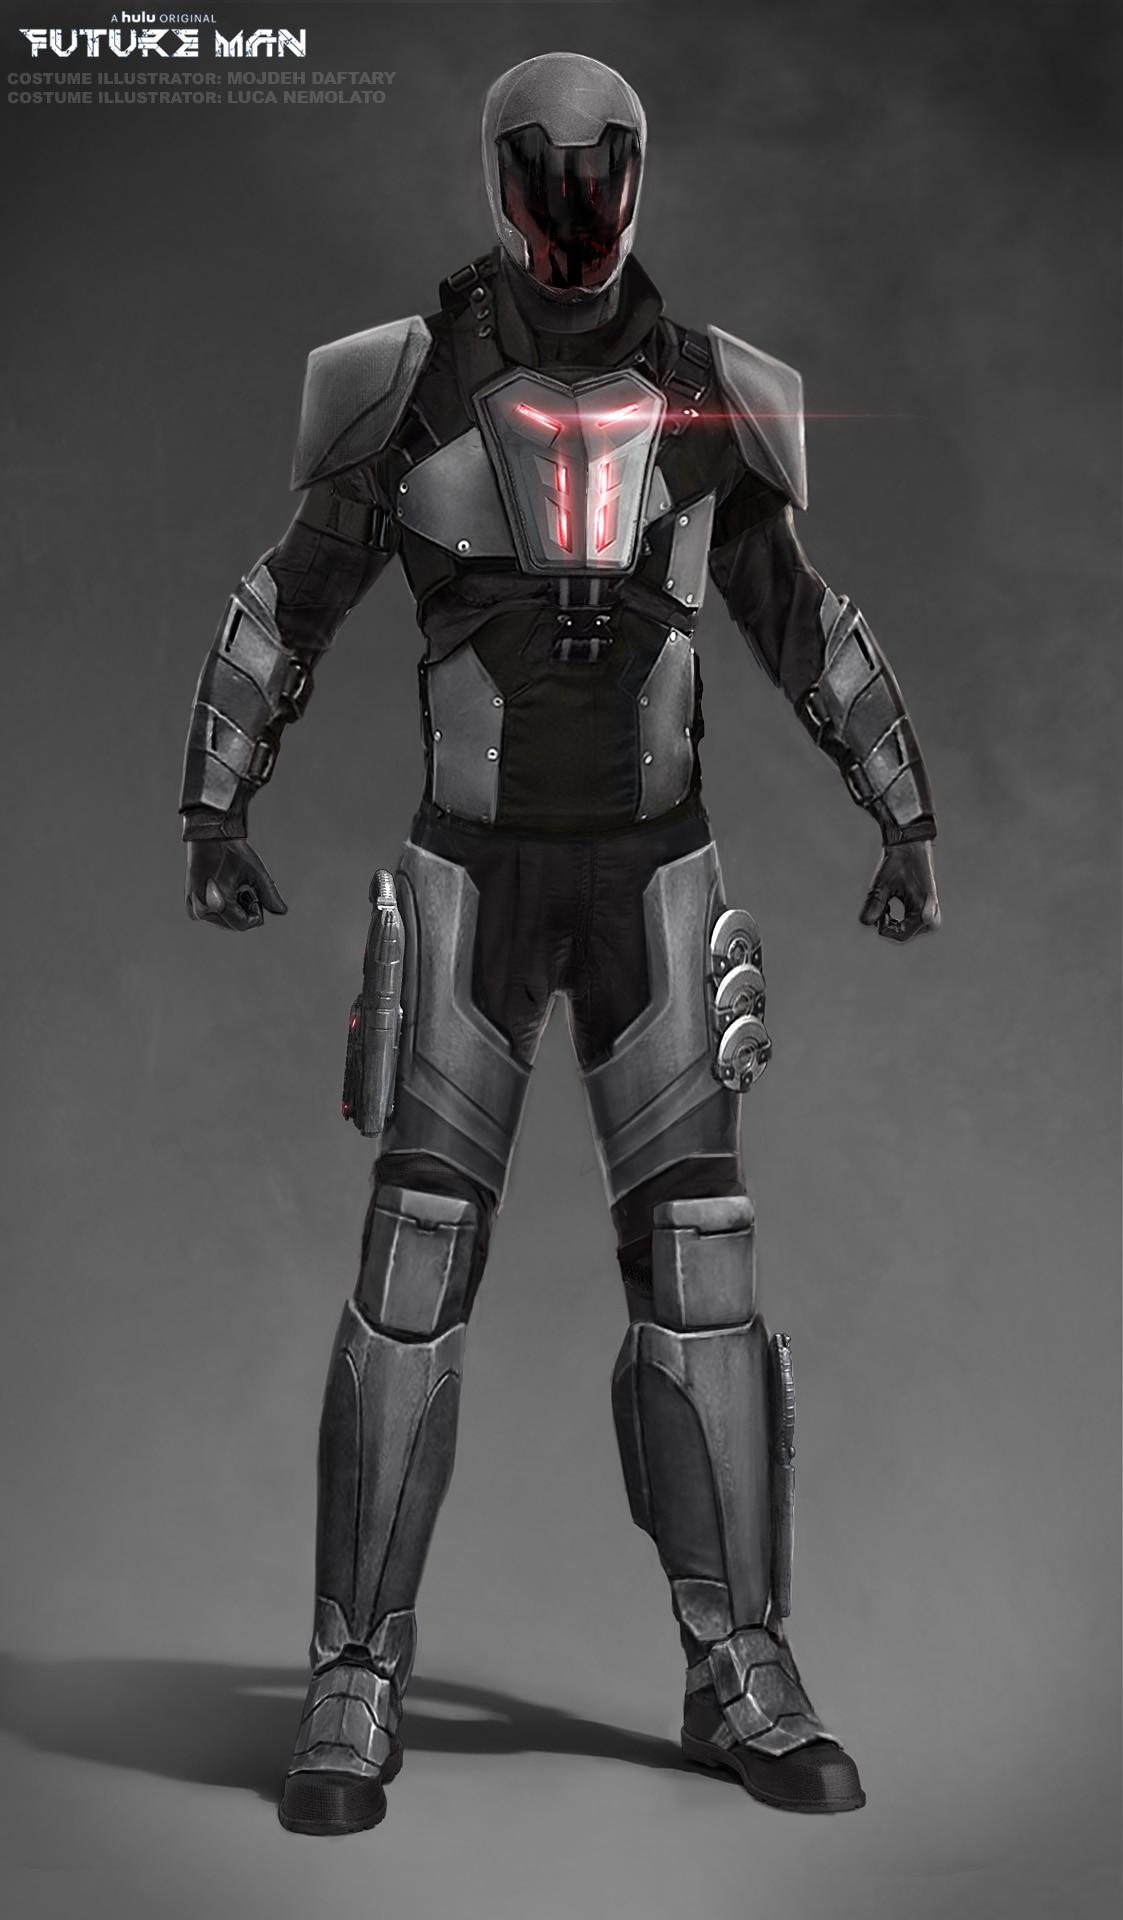 Spoiler Free Movie Sleuth: Images: Future Man - Biotics